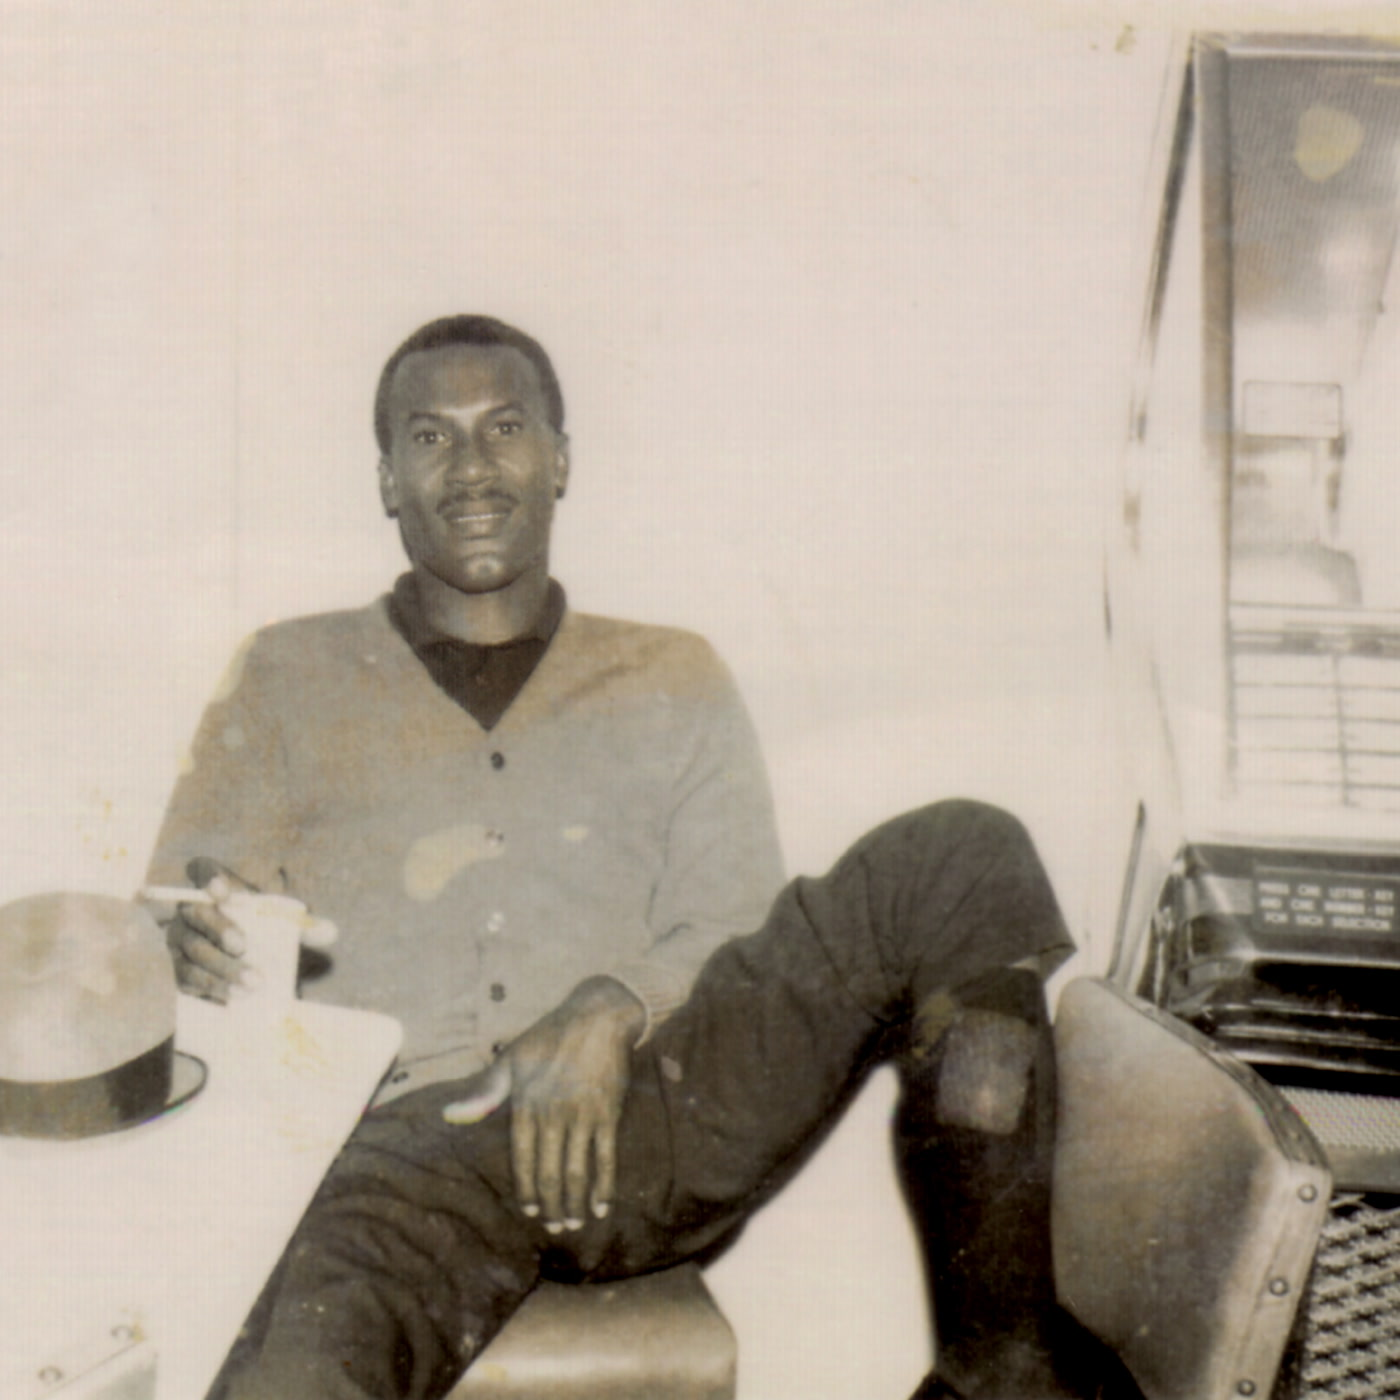 Leon-Gardners-Igloo-Records-Various-Artists.jpg